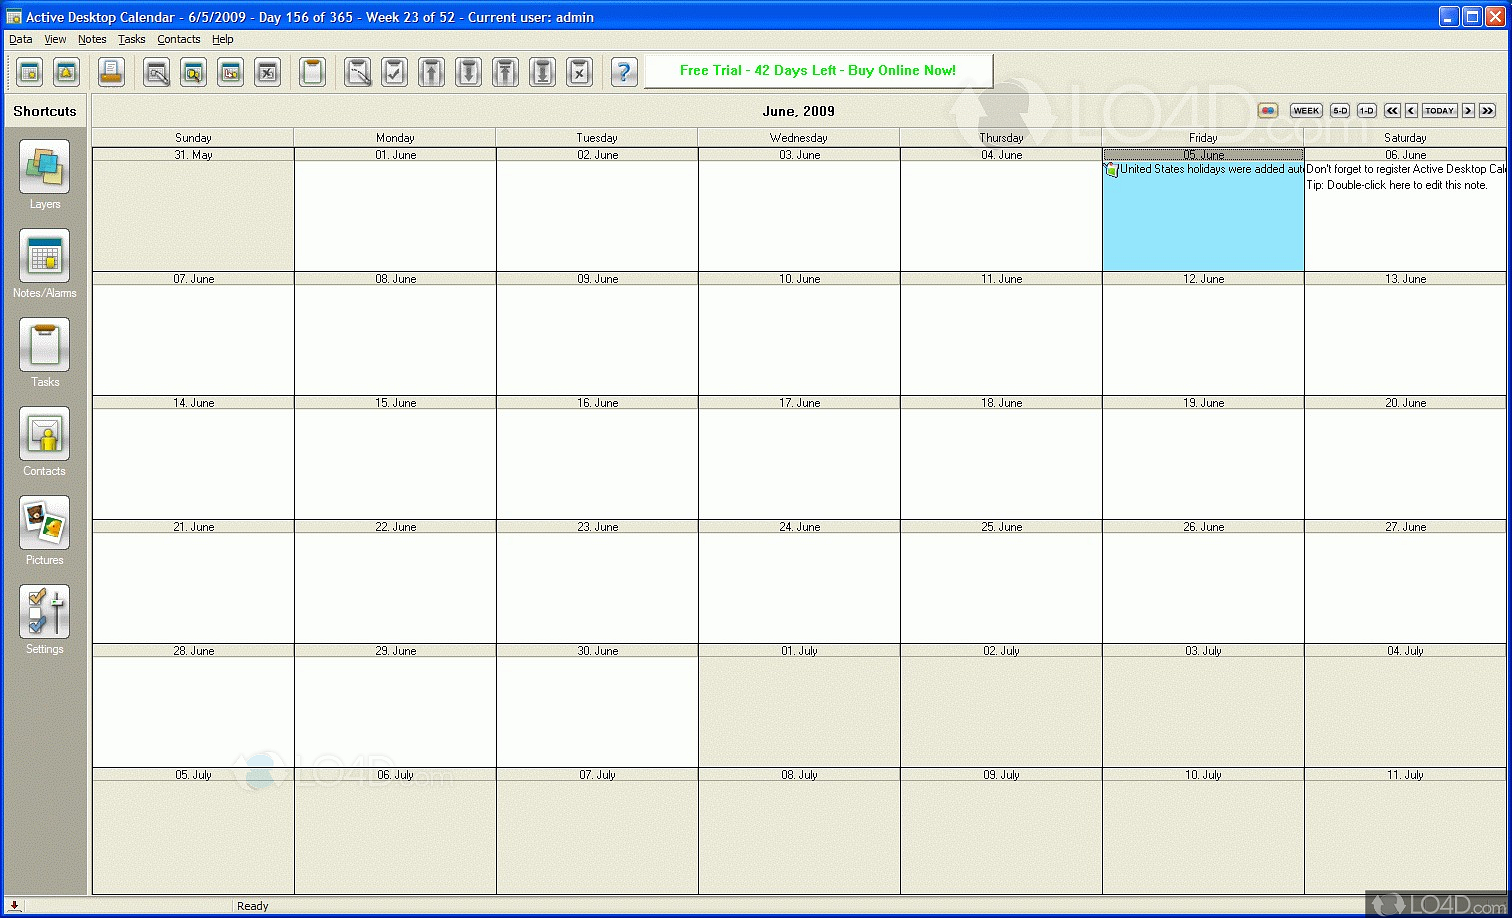 Google calendar is a powerful time management tool. Active Desktop Calendar - Download